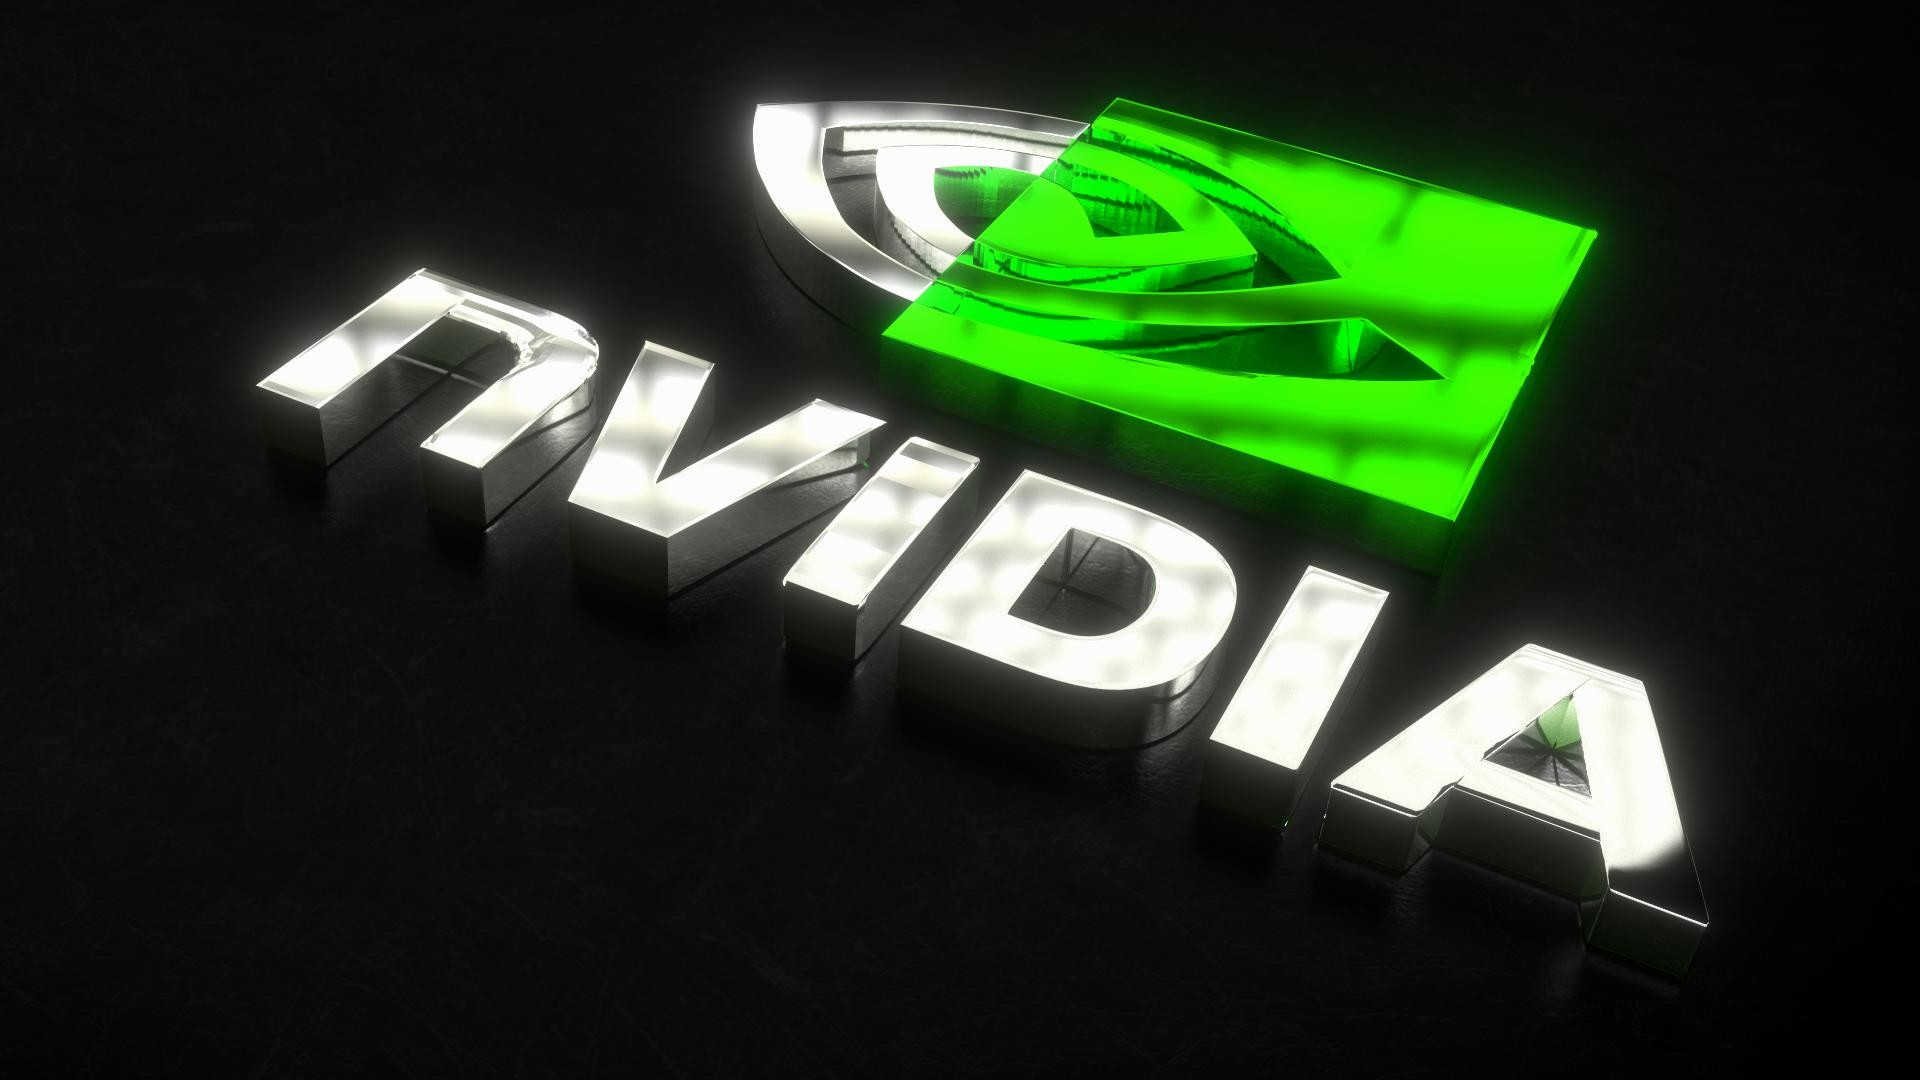 wallpaper.wiki-Nvidia-logo-3d-wallpaper-hd-PIC-